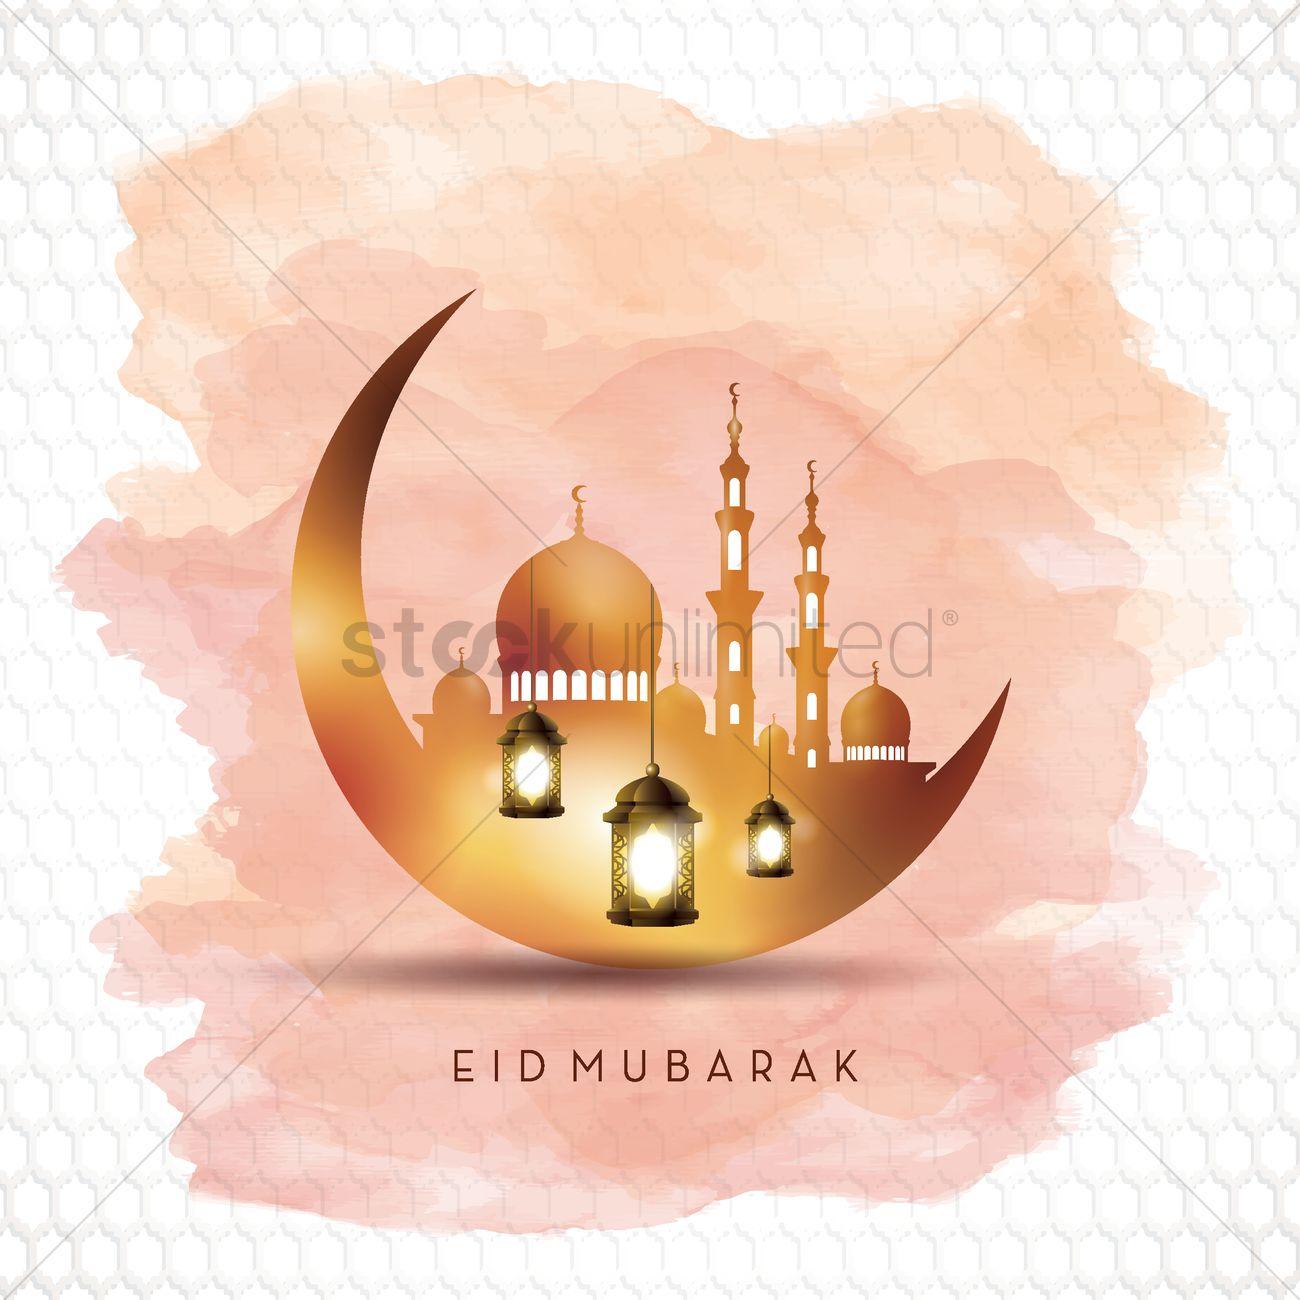 Free eid mubarak stock vectors stockunlimited 1828228 eid mubarak eid mubarak greeting kristyandbryce Image collections